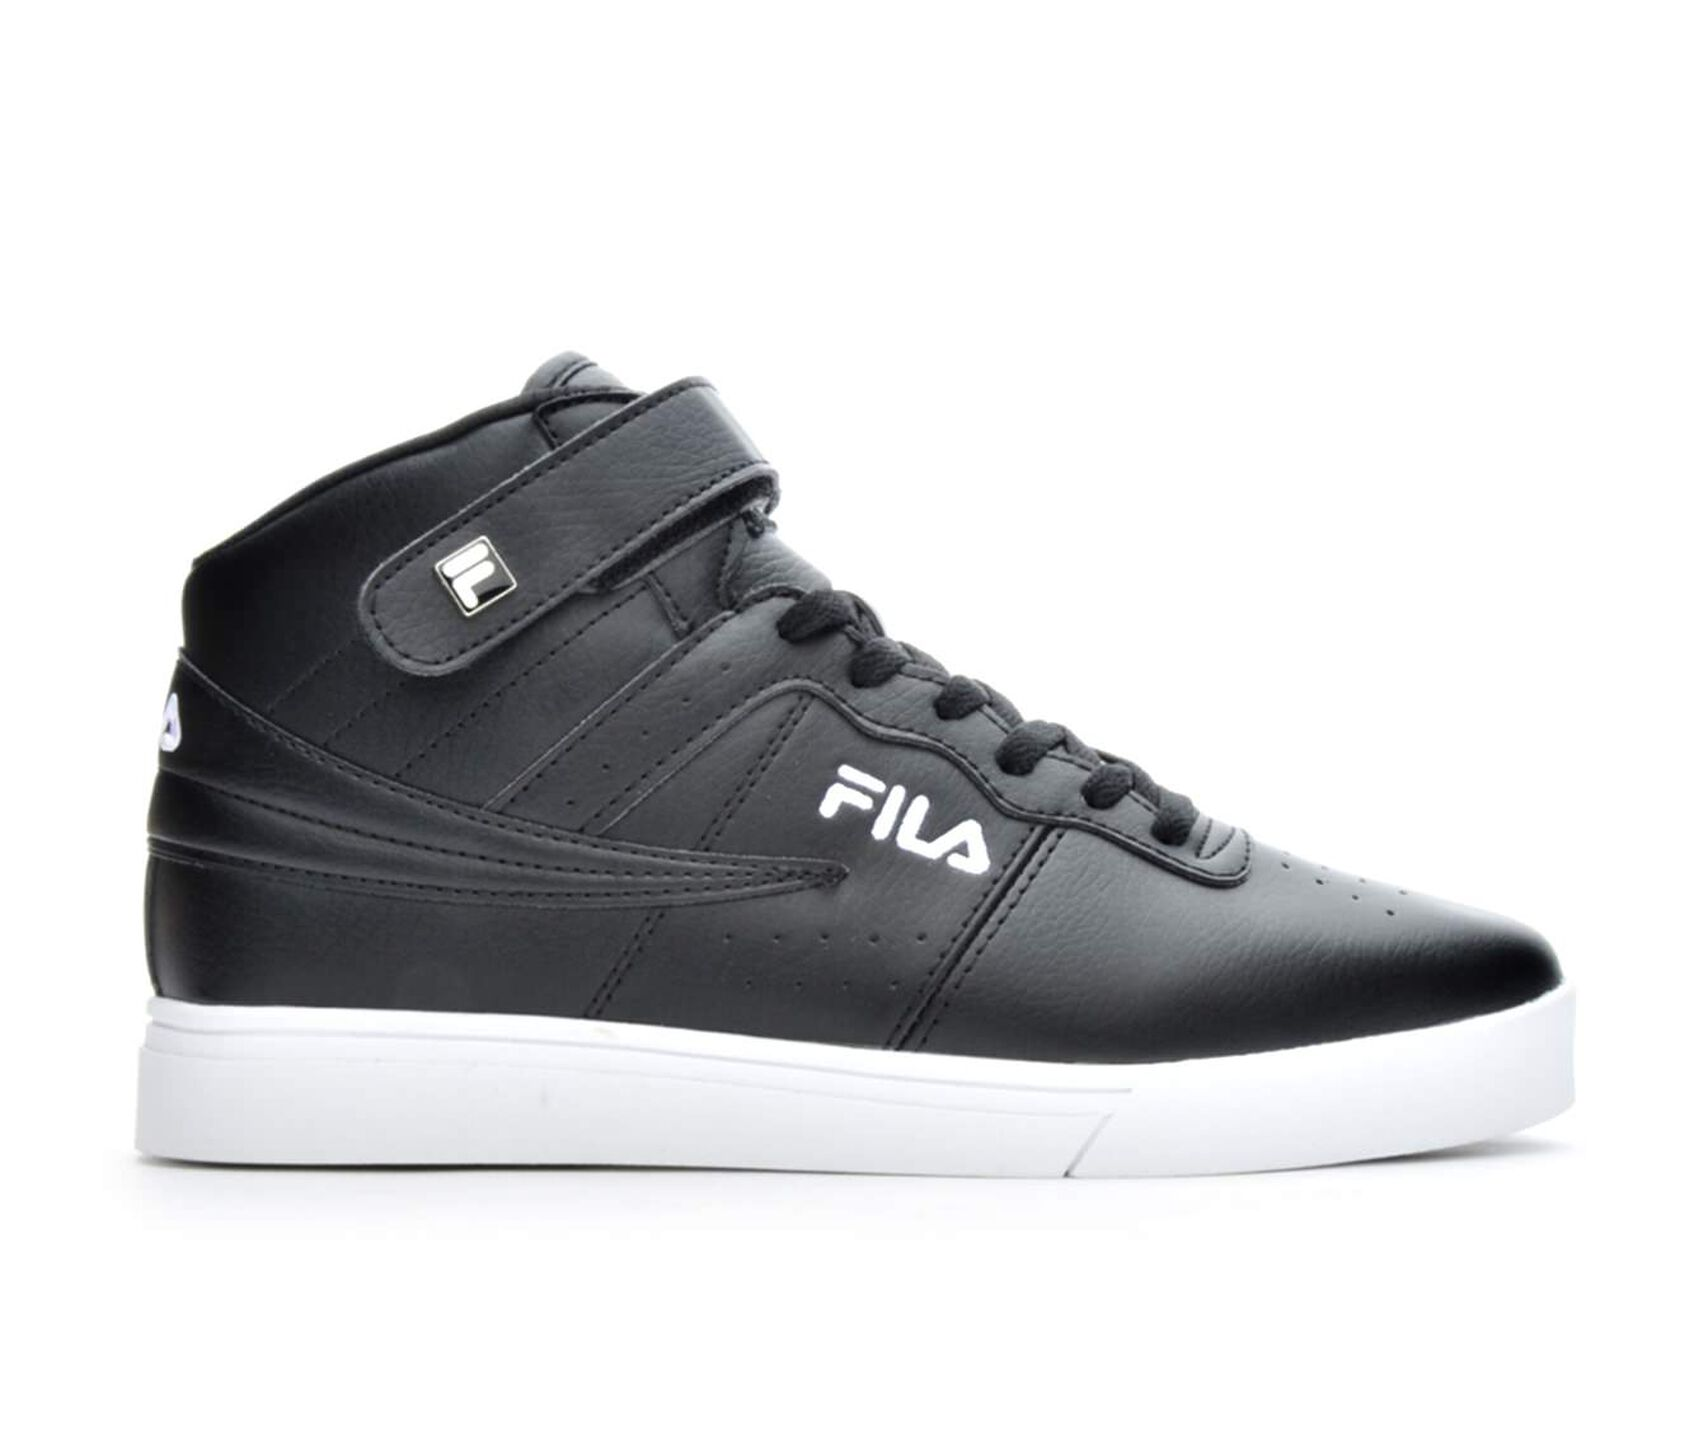 b927a873cd24 Men s Fila Vulc 13 Mid Plus Retro Sneakers